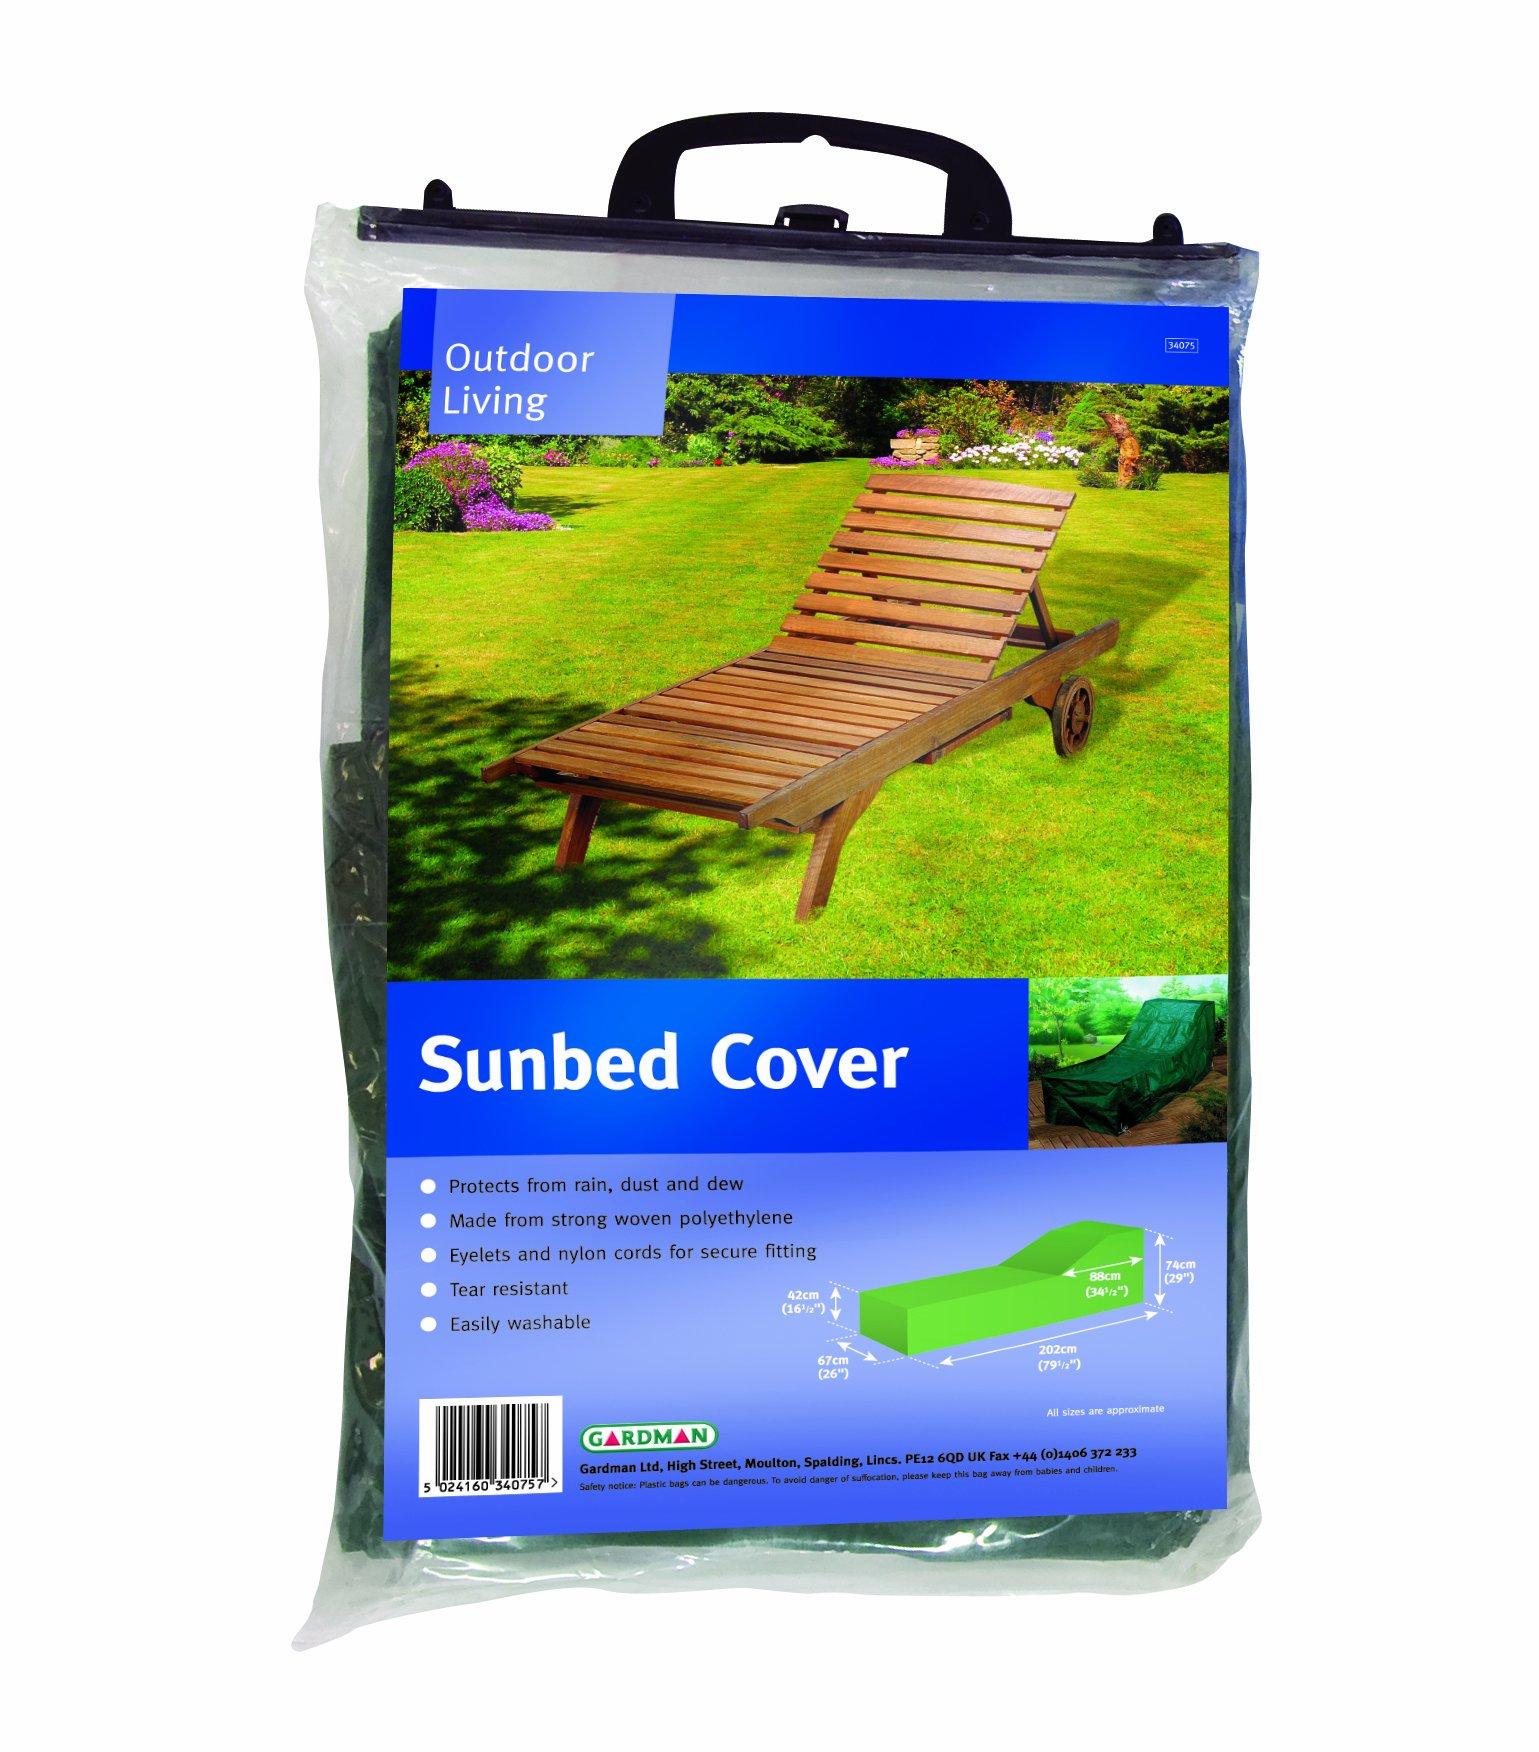 Gardman sunbed lounger waterproof green garden protection for Amazon gardman furniture covers